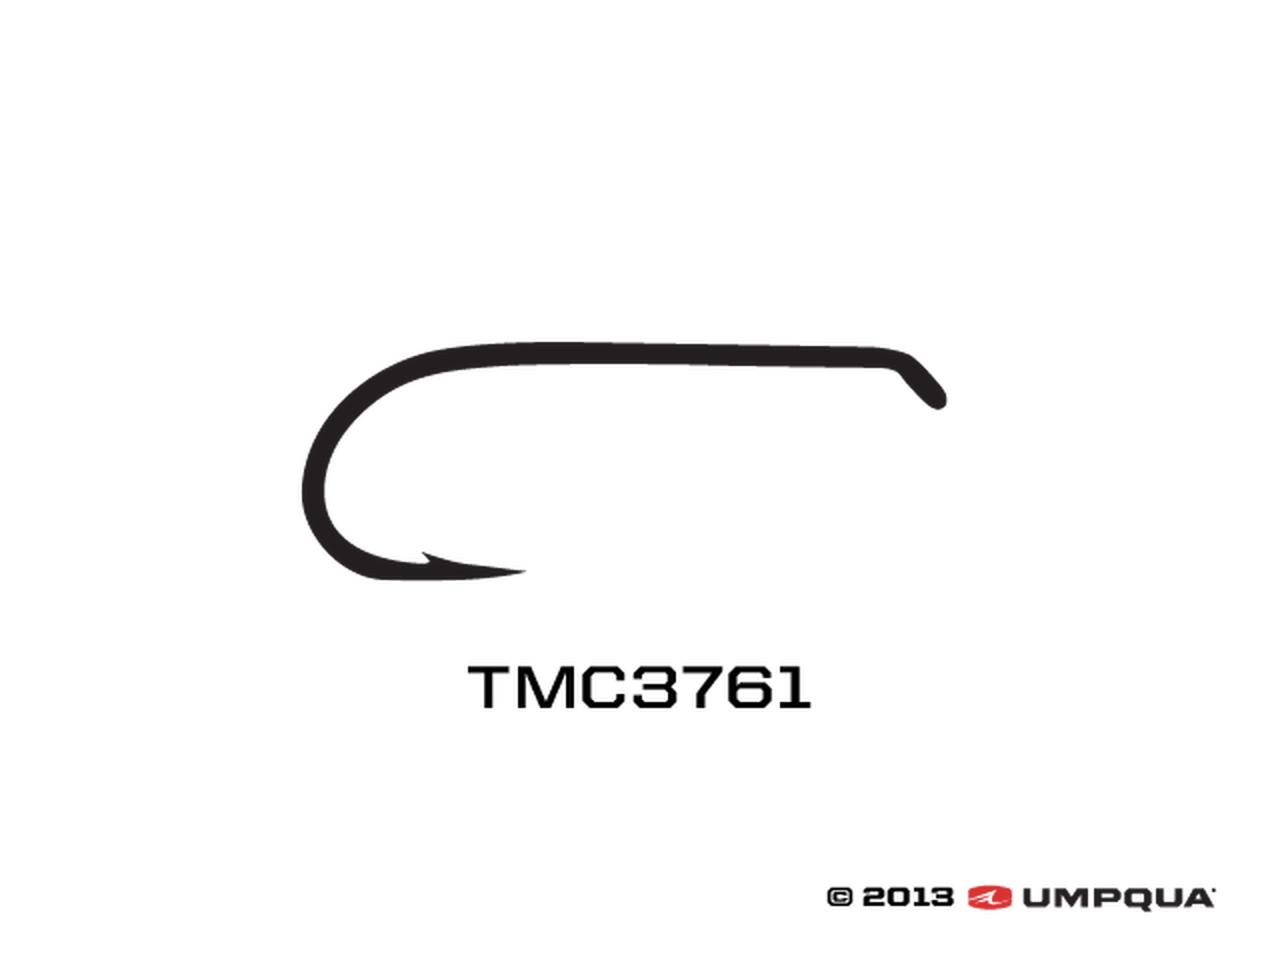 Tiemco TMC 3761